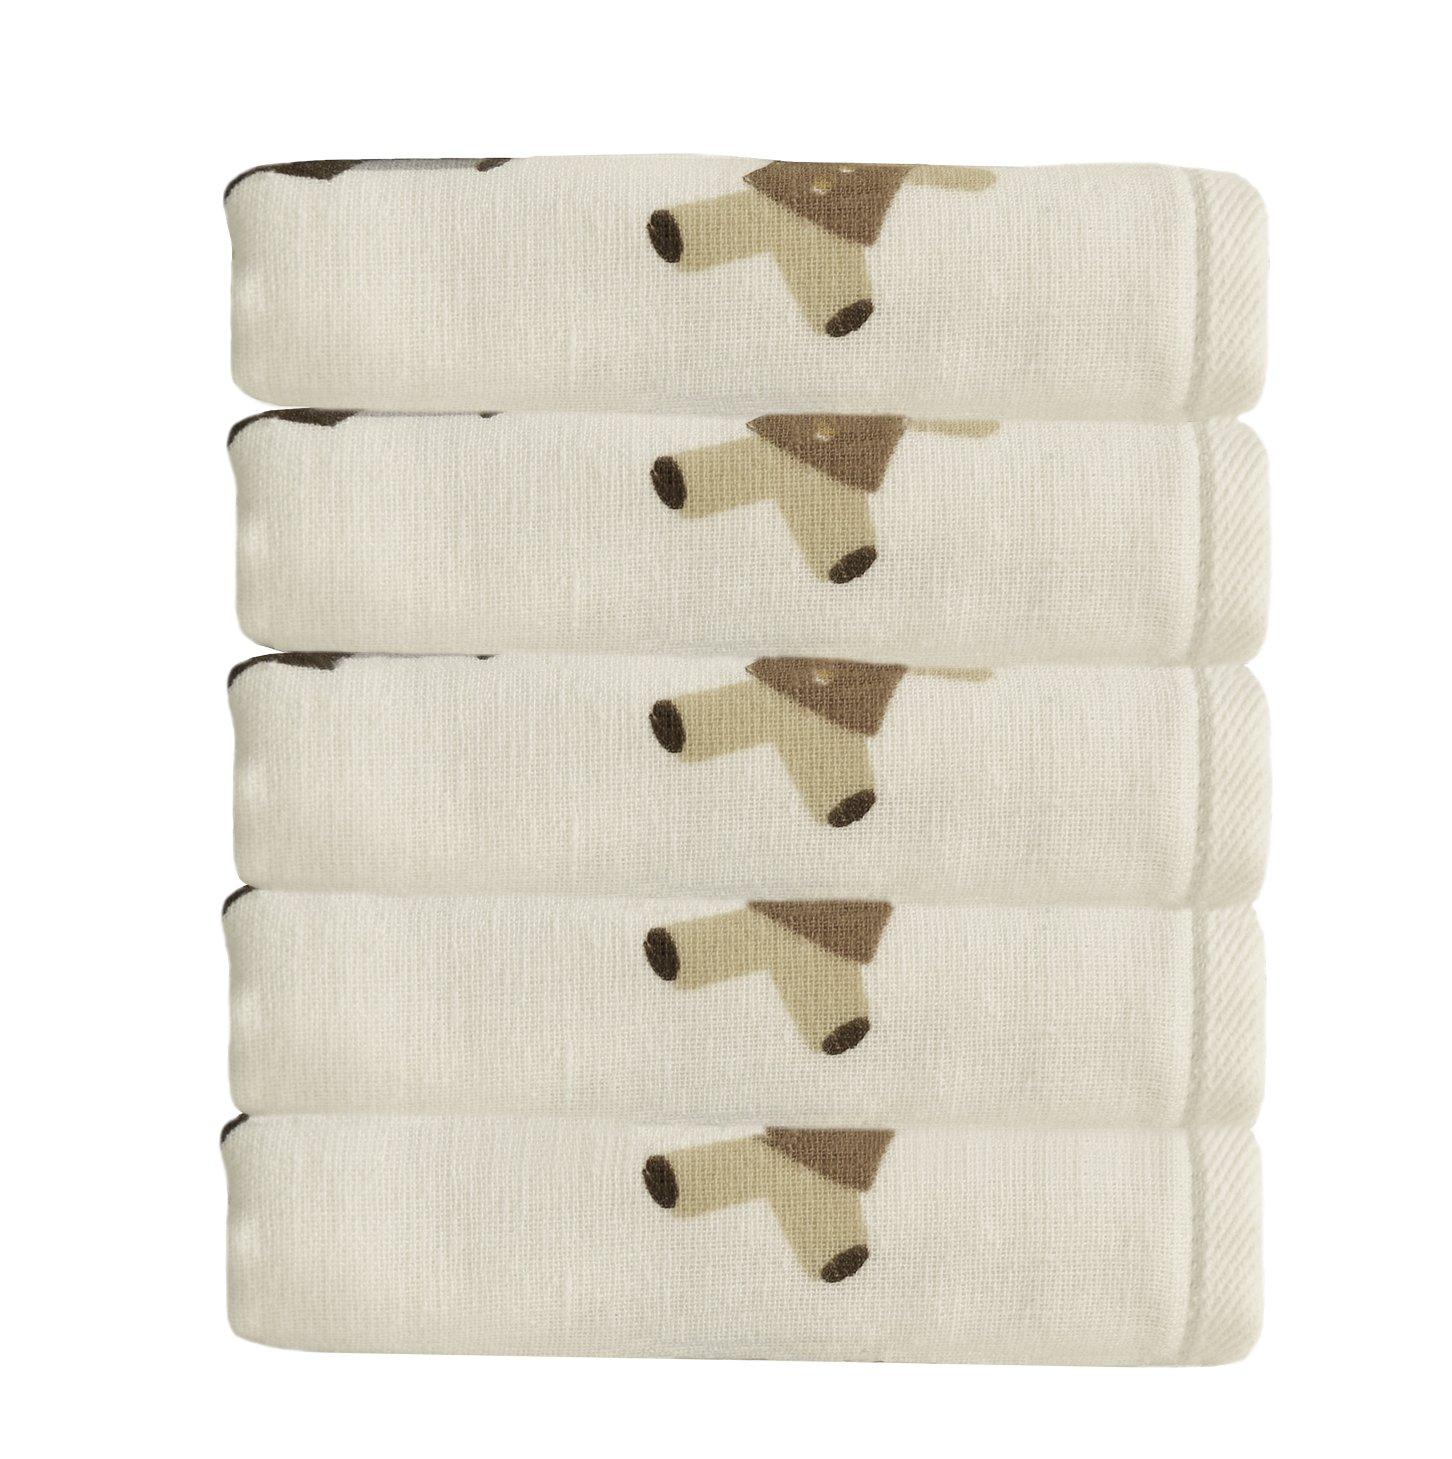 MAGILONA 5 Piece Toddler Children Kids Cartoon Animal 100% Soft Cotton Yarn Double Layer Towels Strong Water Absorption (Bear)